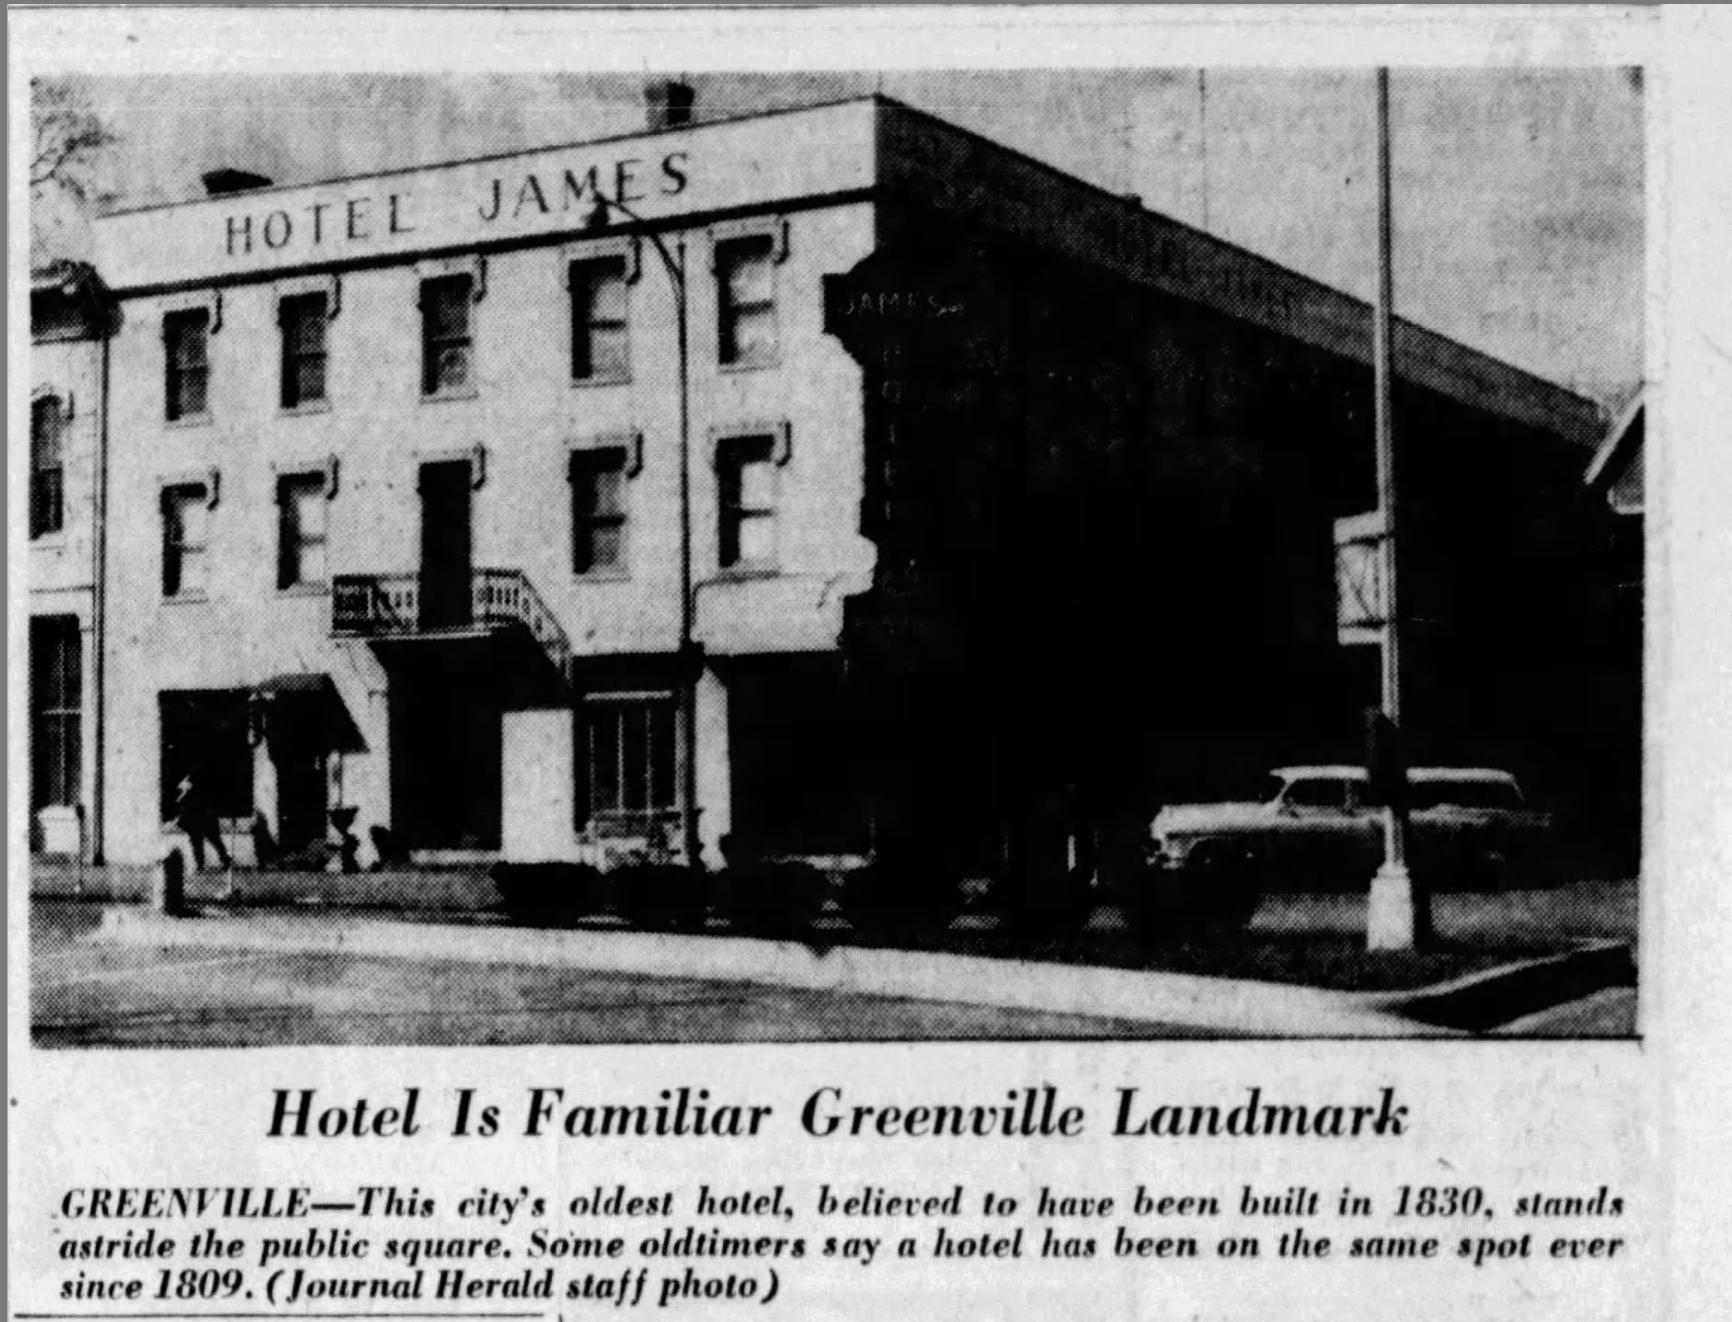 The Journal Herald (Dayton, OH) - Feb. 22, 1956